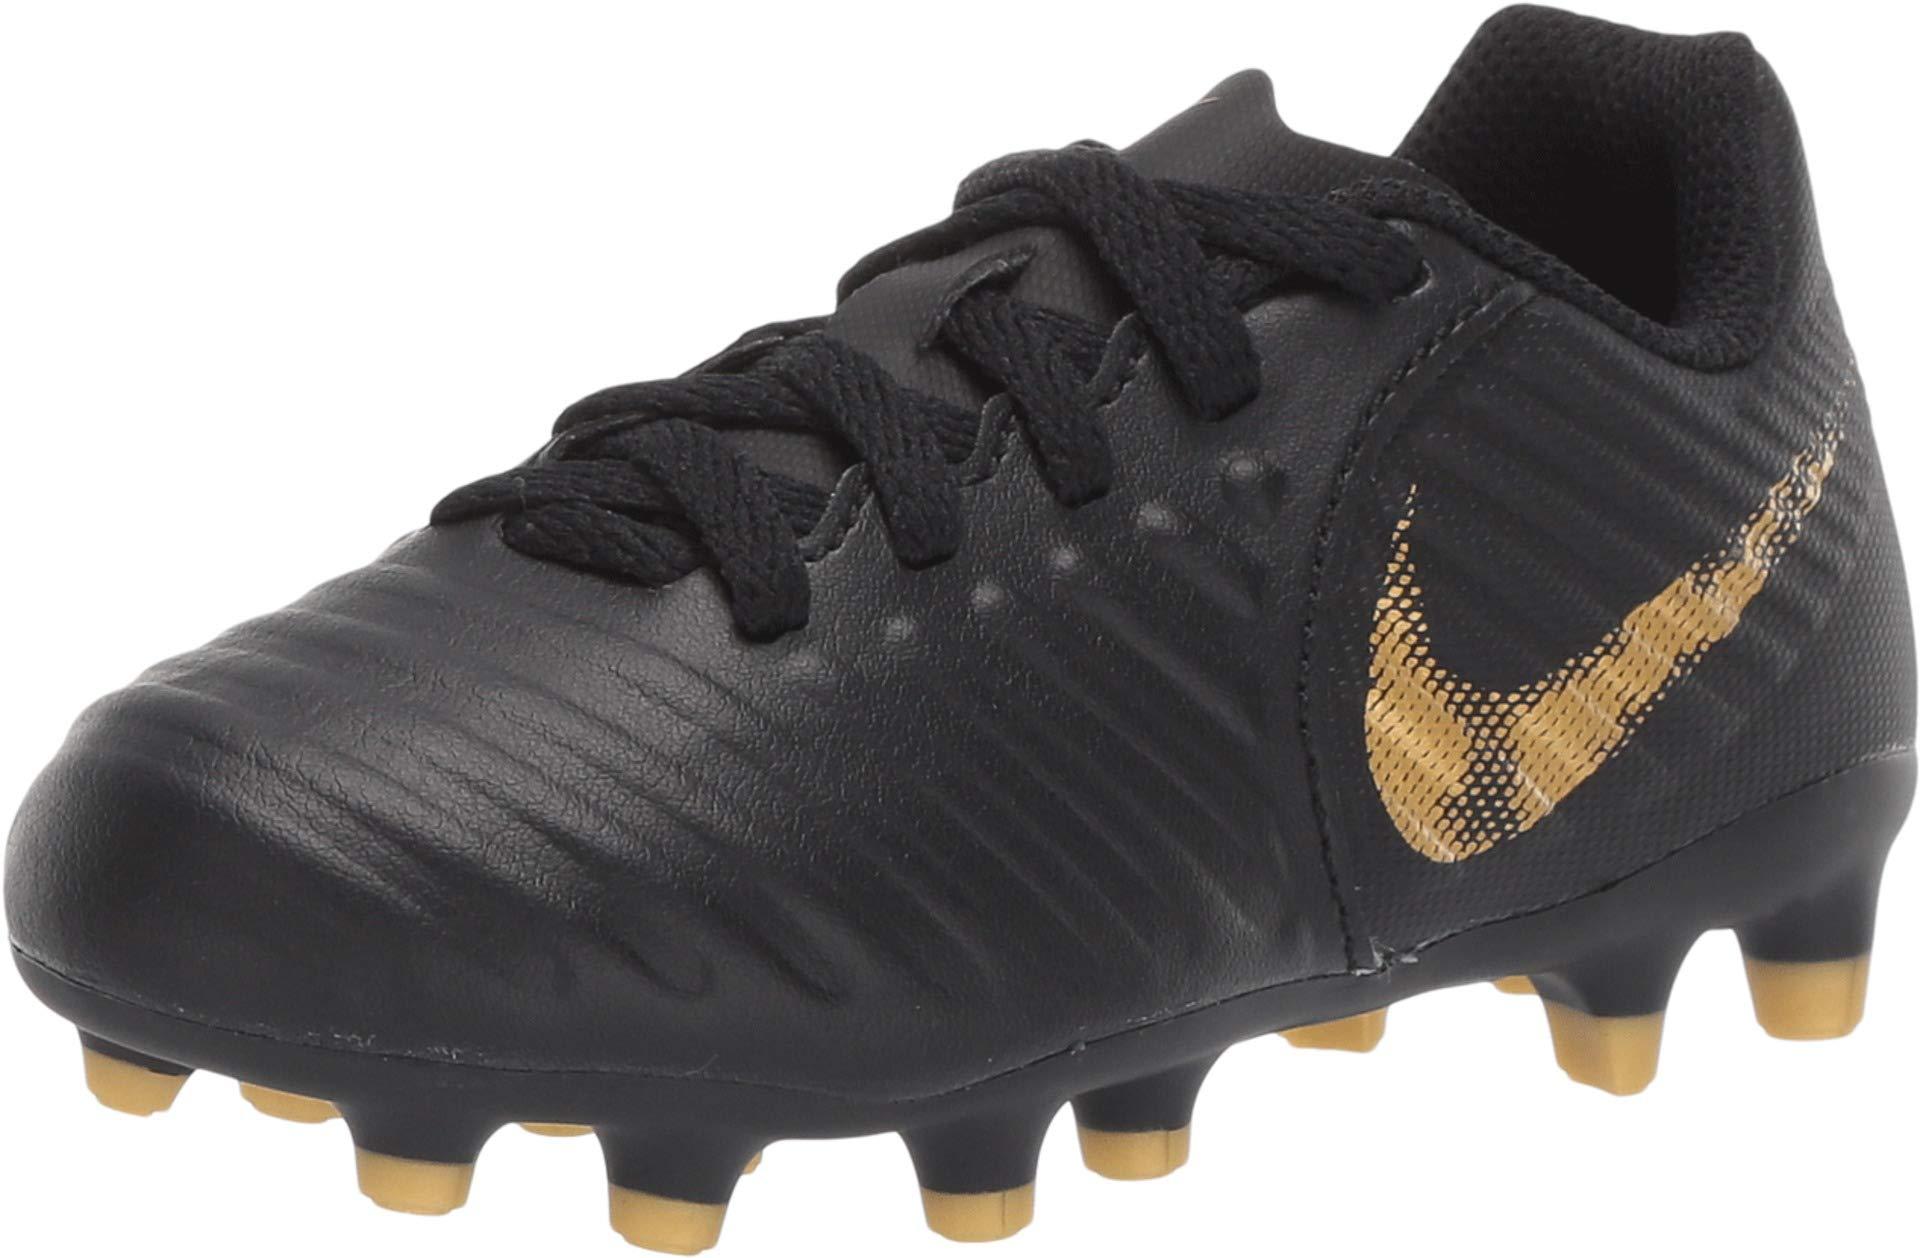 Nike Youth Legend 7 Club MG Soccer Cleats (Black/Metallic Vivid Gold) (3Y)